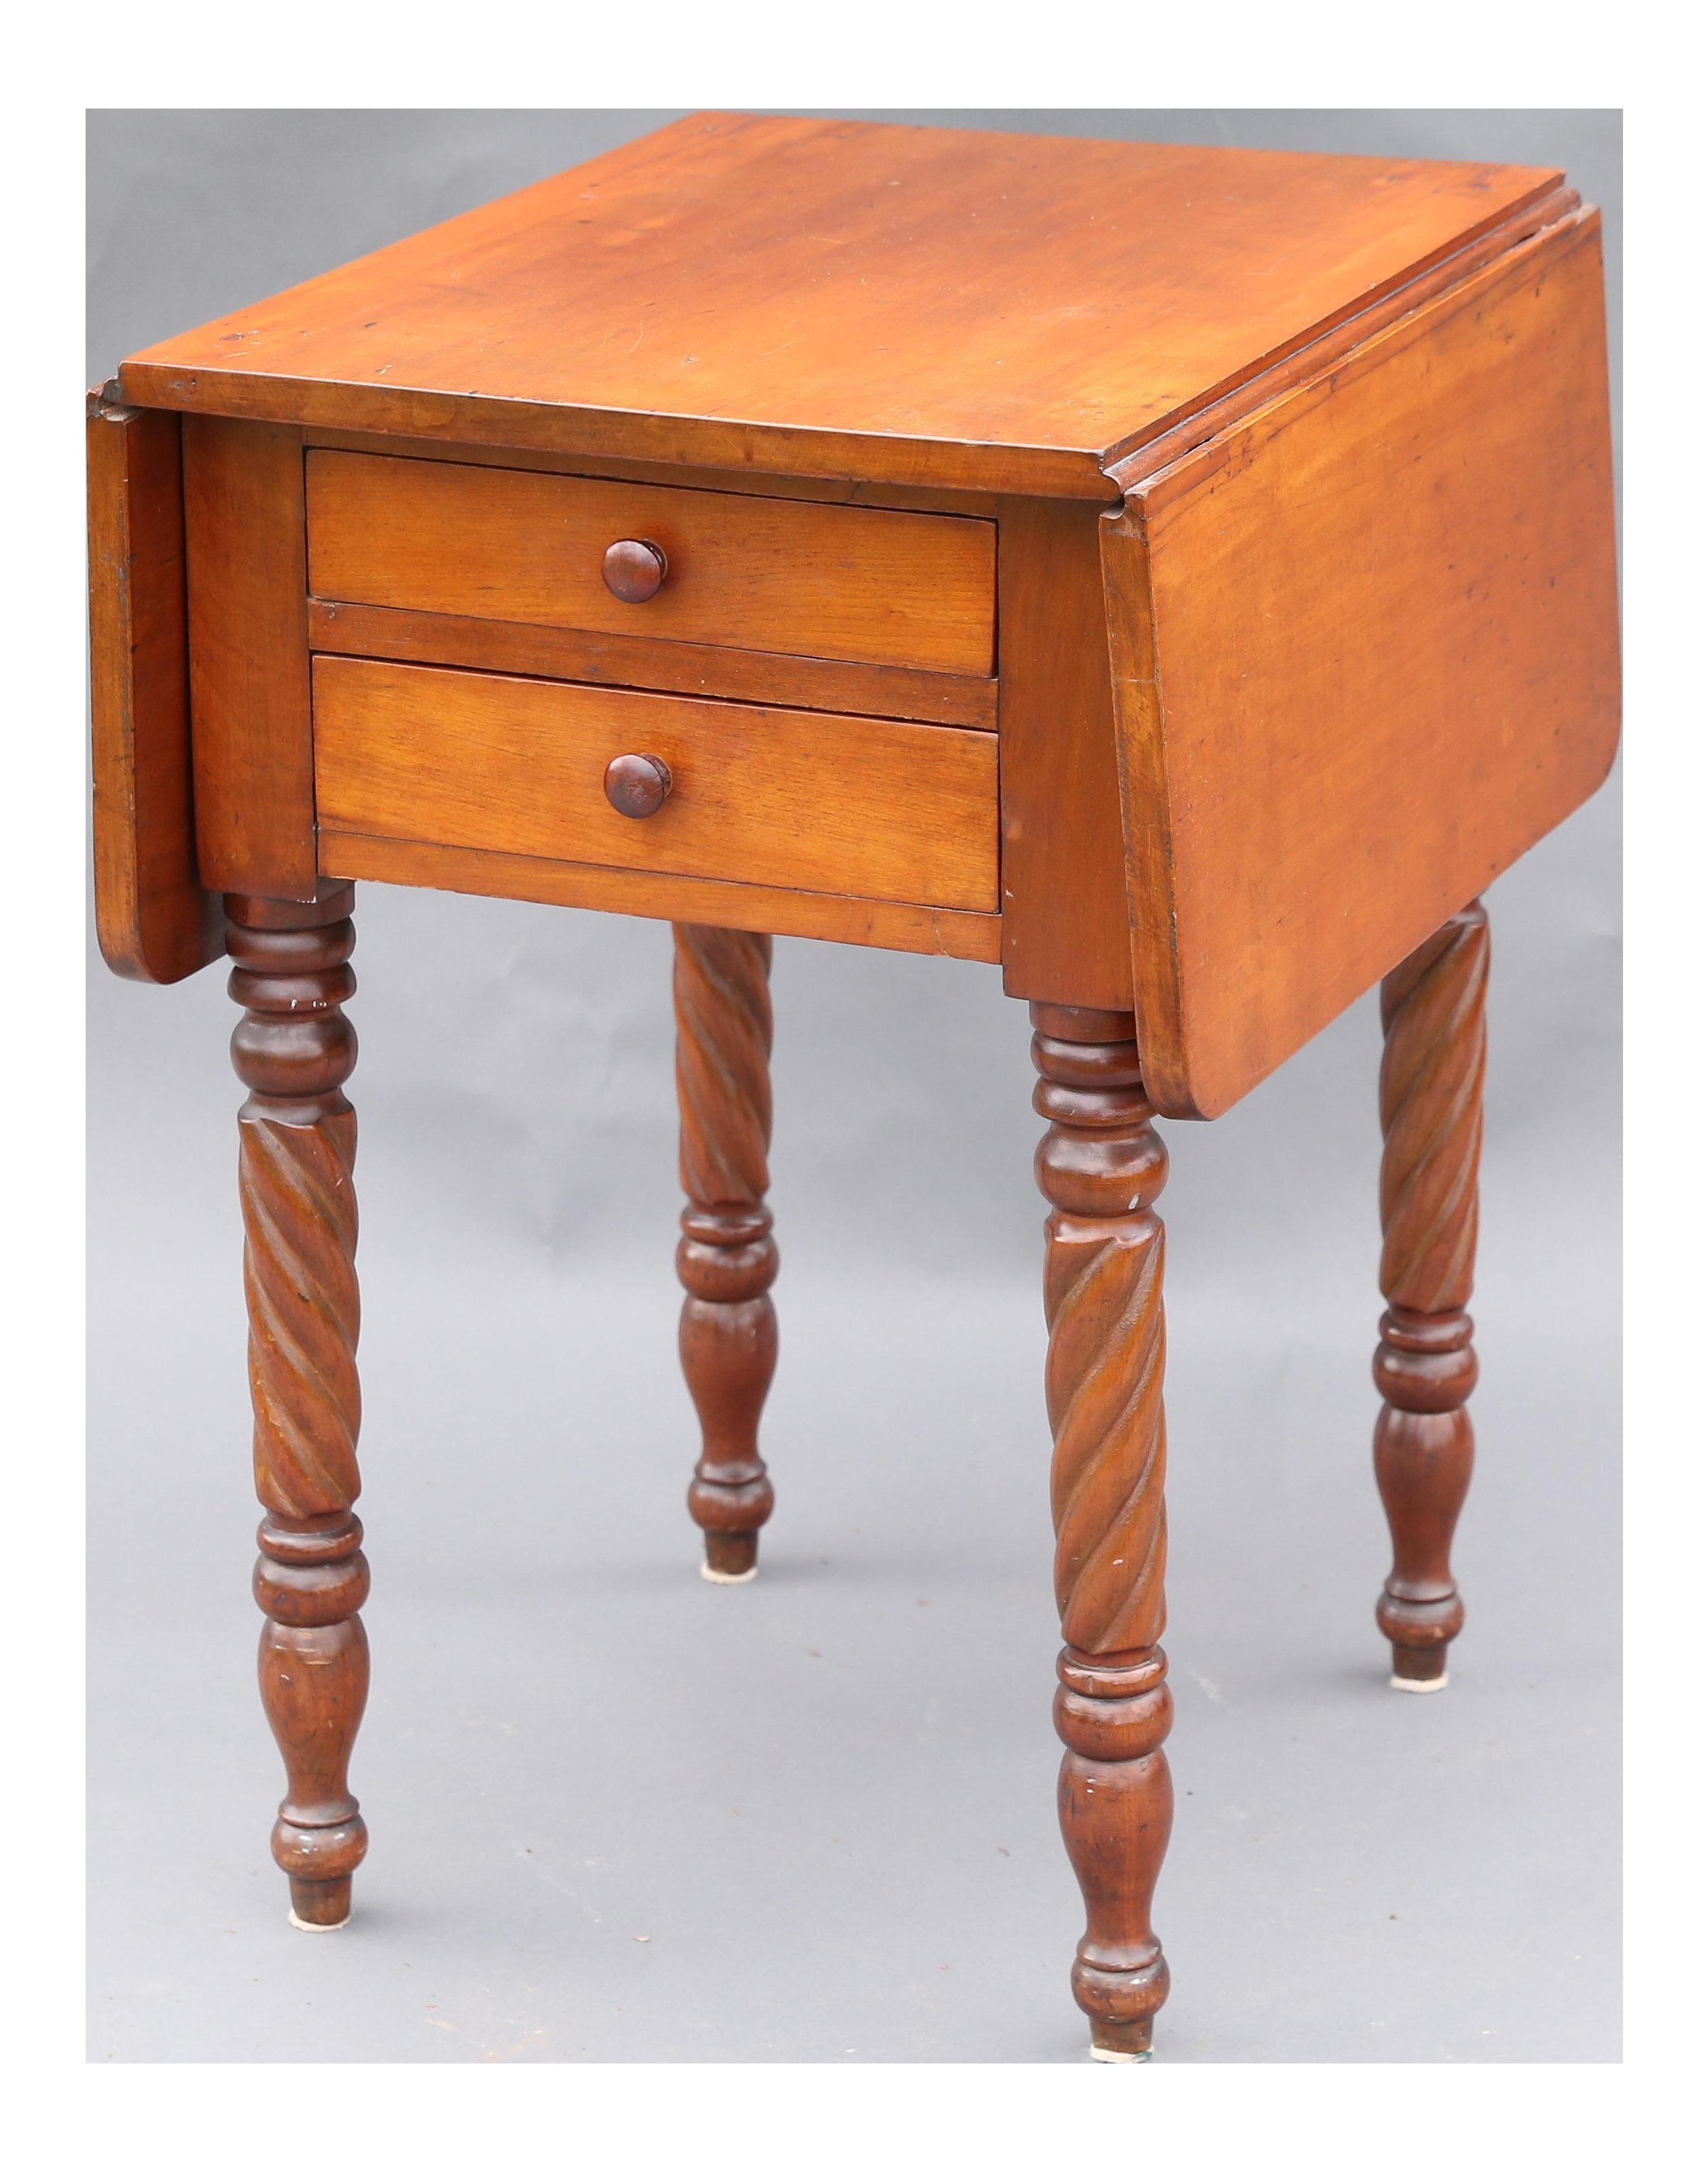 Pembroke Drop Leaf Table Chairish : pembroke drop leaf table 1190 from www.chairish.com size 2534 x 3222 png 4947kB